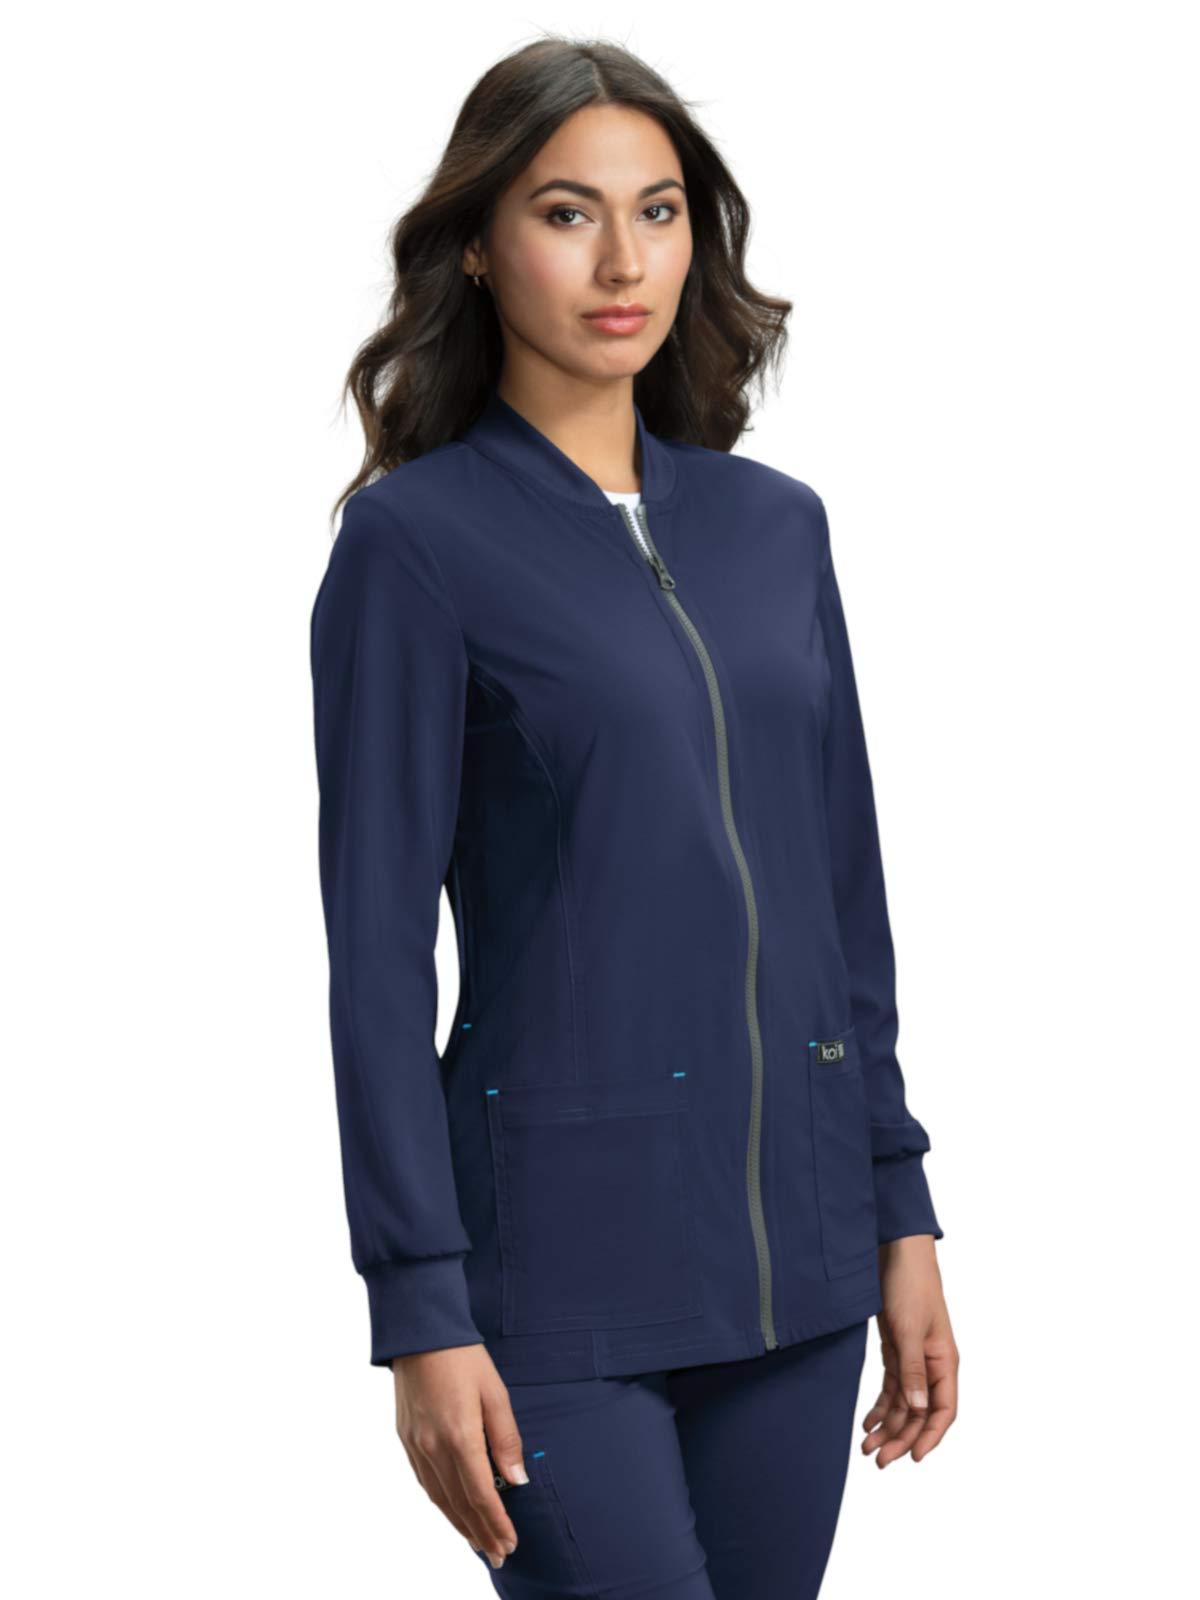 KOI Basics Ultra Comfortable Moisture-Wicking Andrea Scrub Jacket for Women